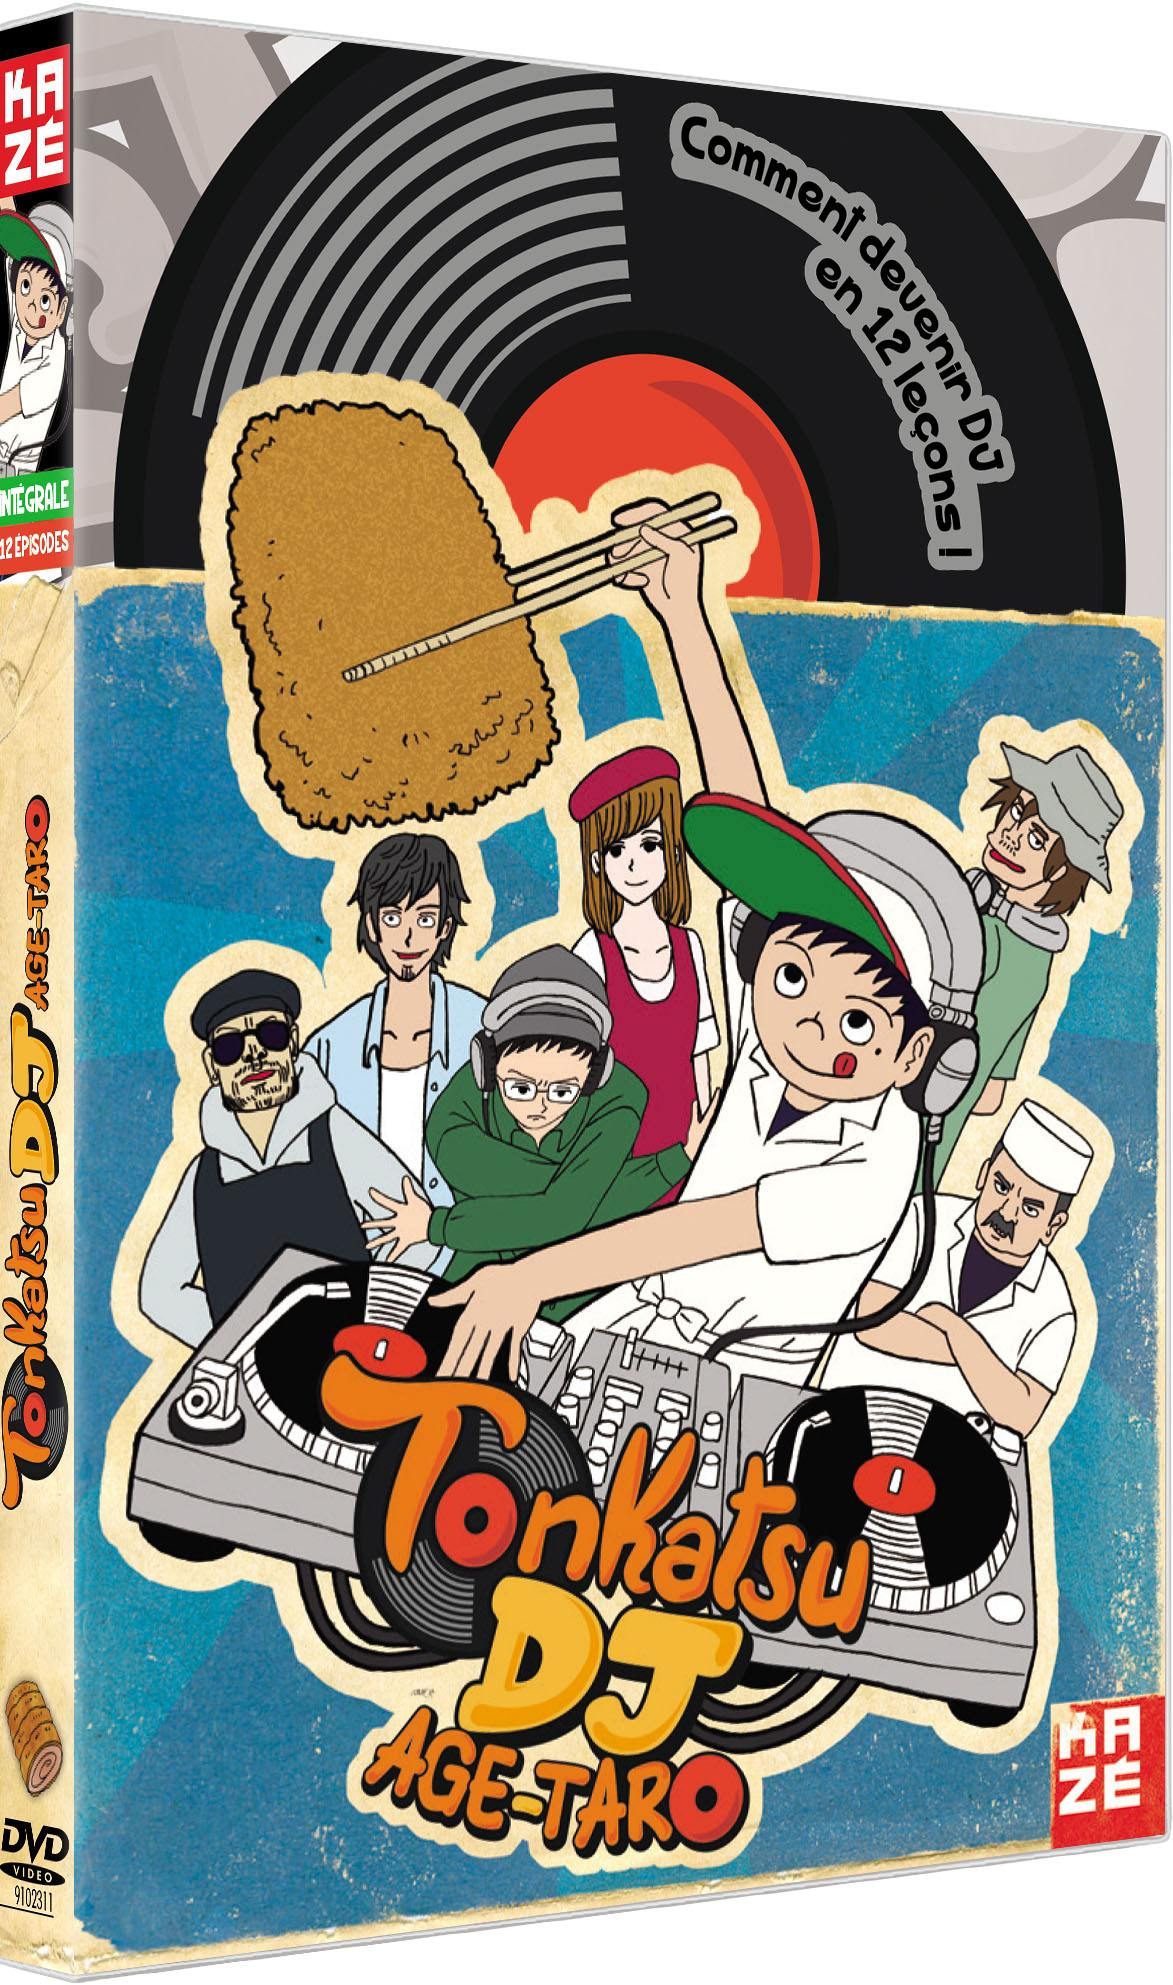 Tonkatsu dj - integrale serie - dvd